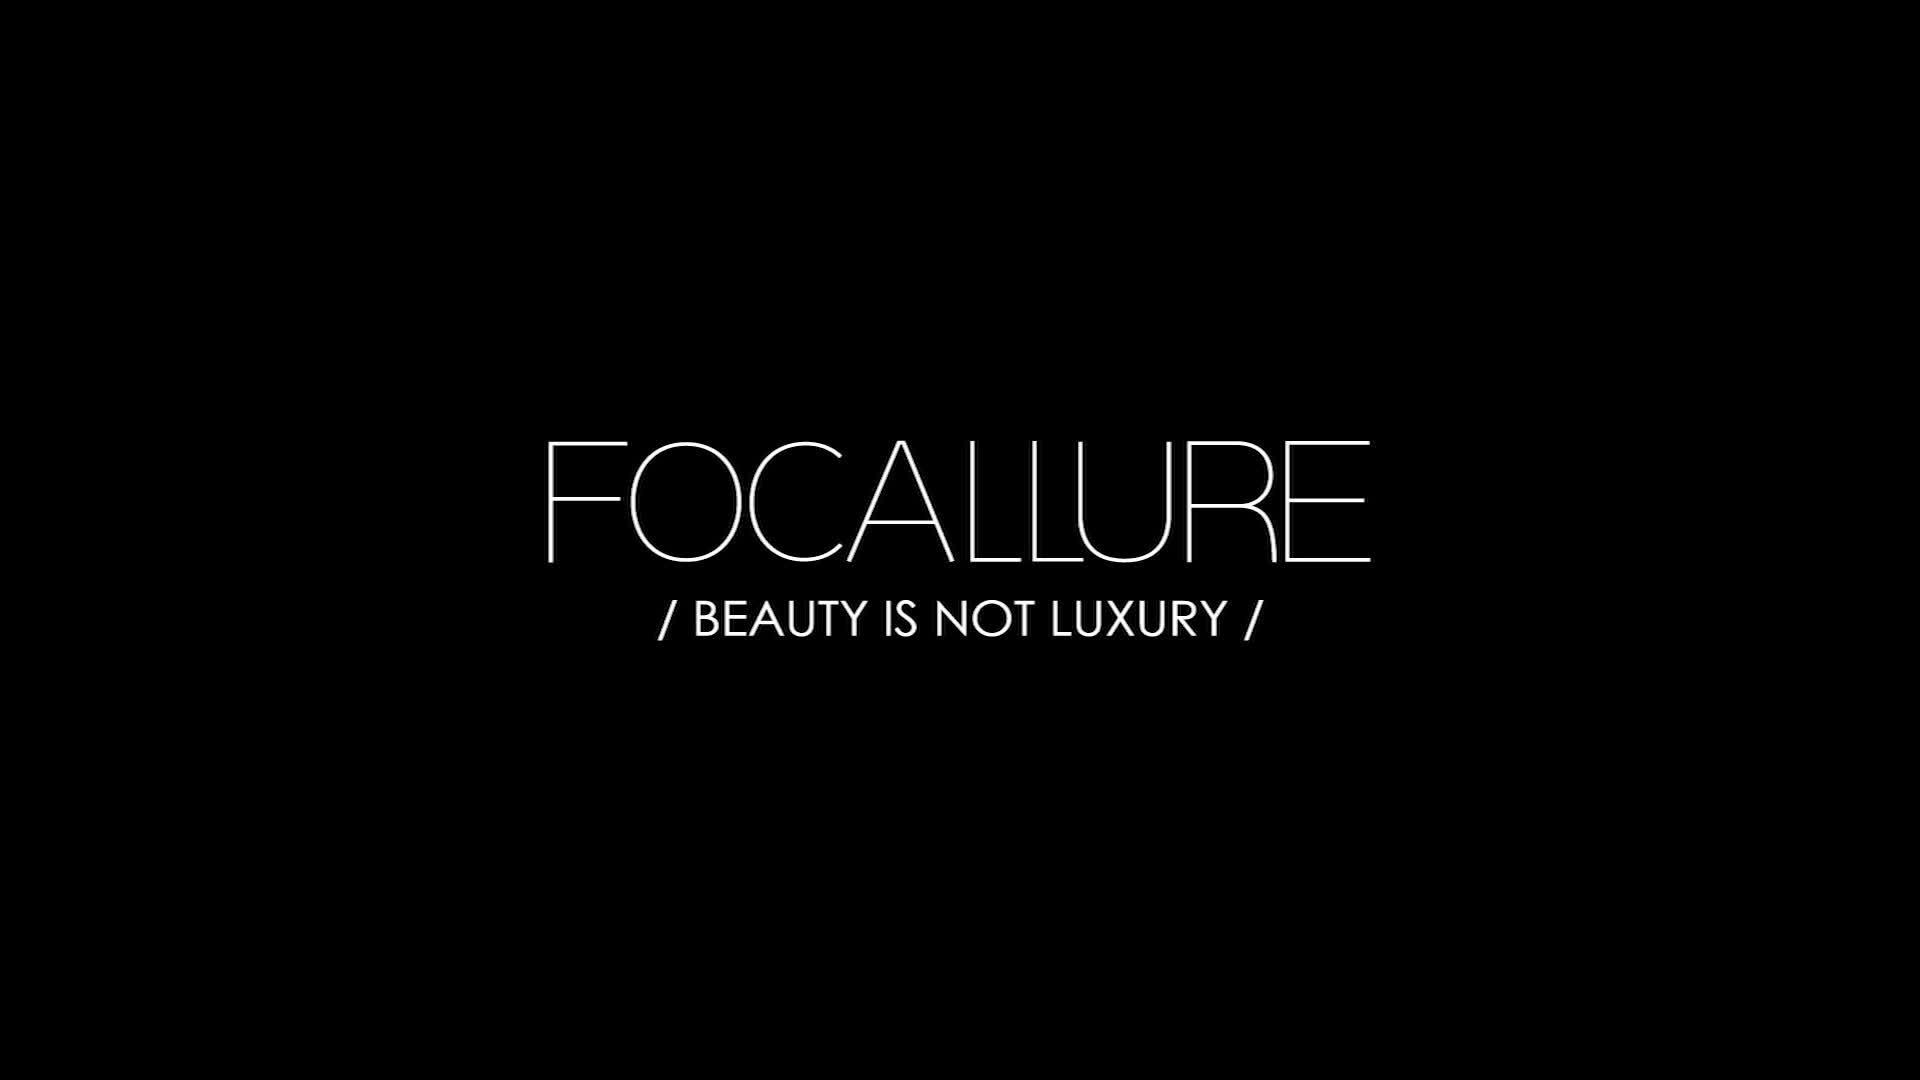 Focallure चीन वर्णक शिमर निविड़ अंधकार सस्ते मेकअप आंखों के छायाएं पैलेट कॉस्मेटिक थोक